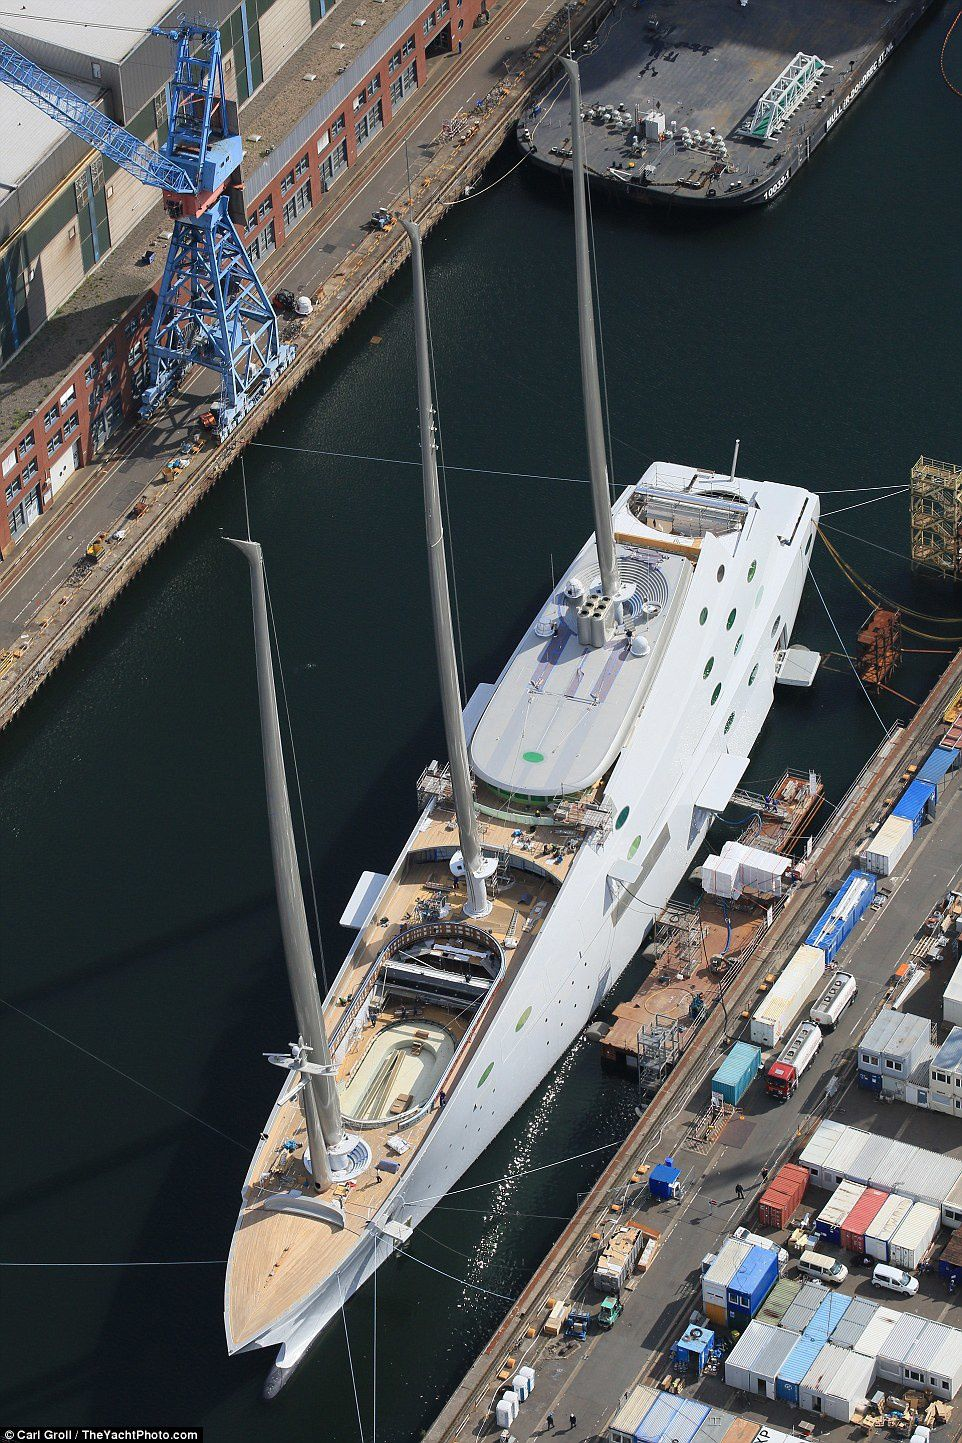 World Largest Sailing Yacht &quot&#x3B;A&quot&#x3B; Superyacht grande yate grand voilier